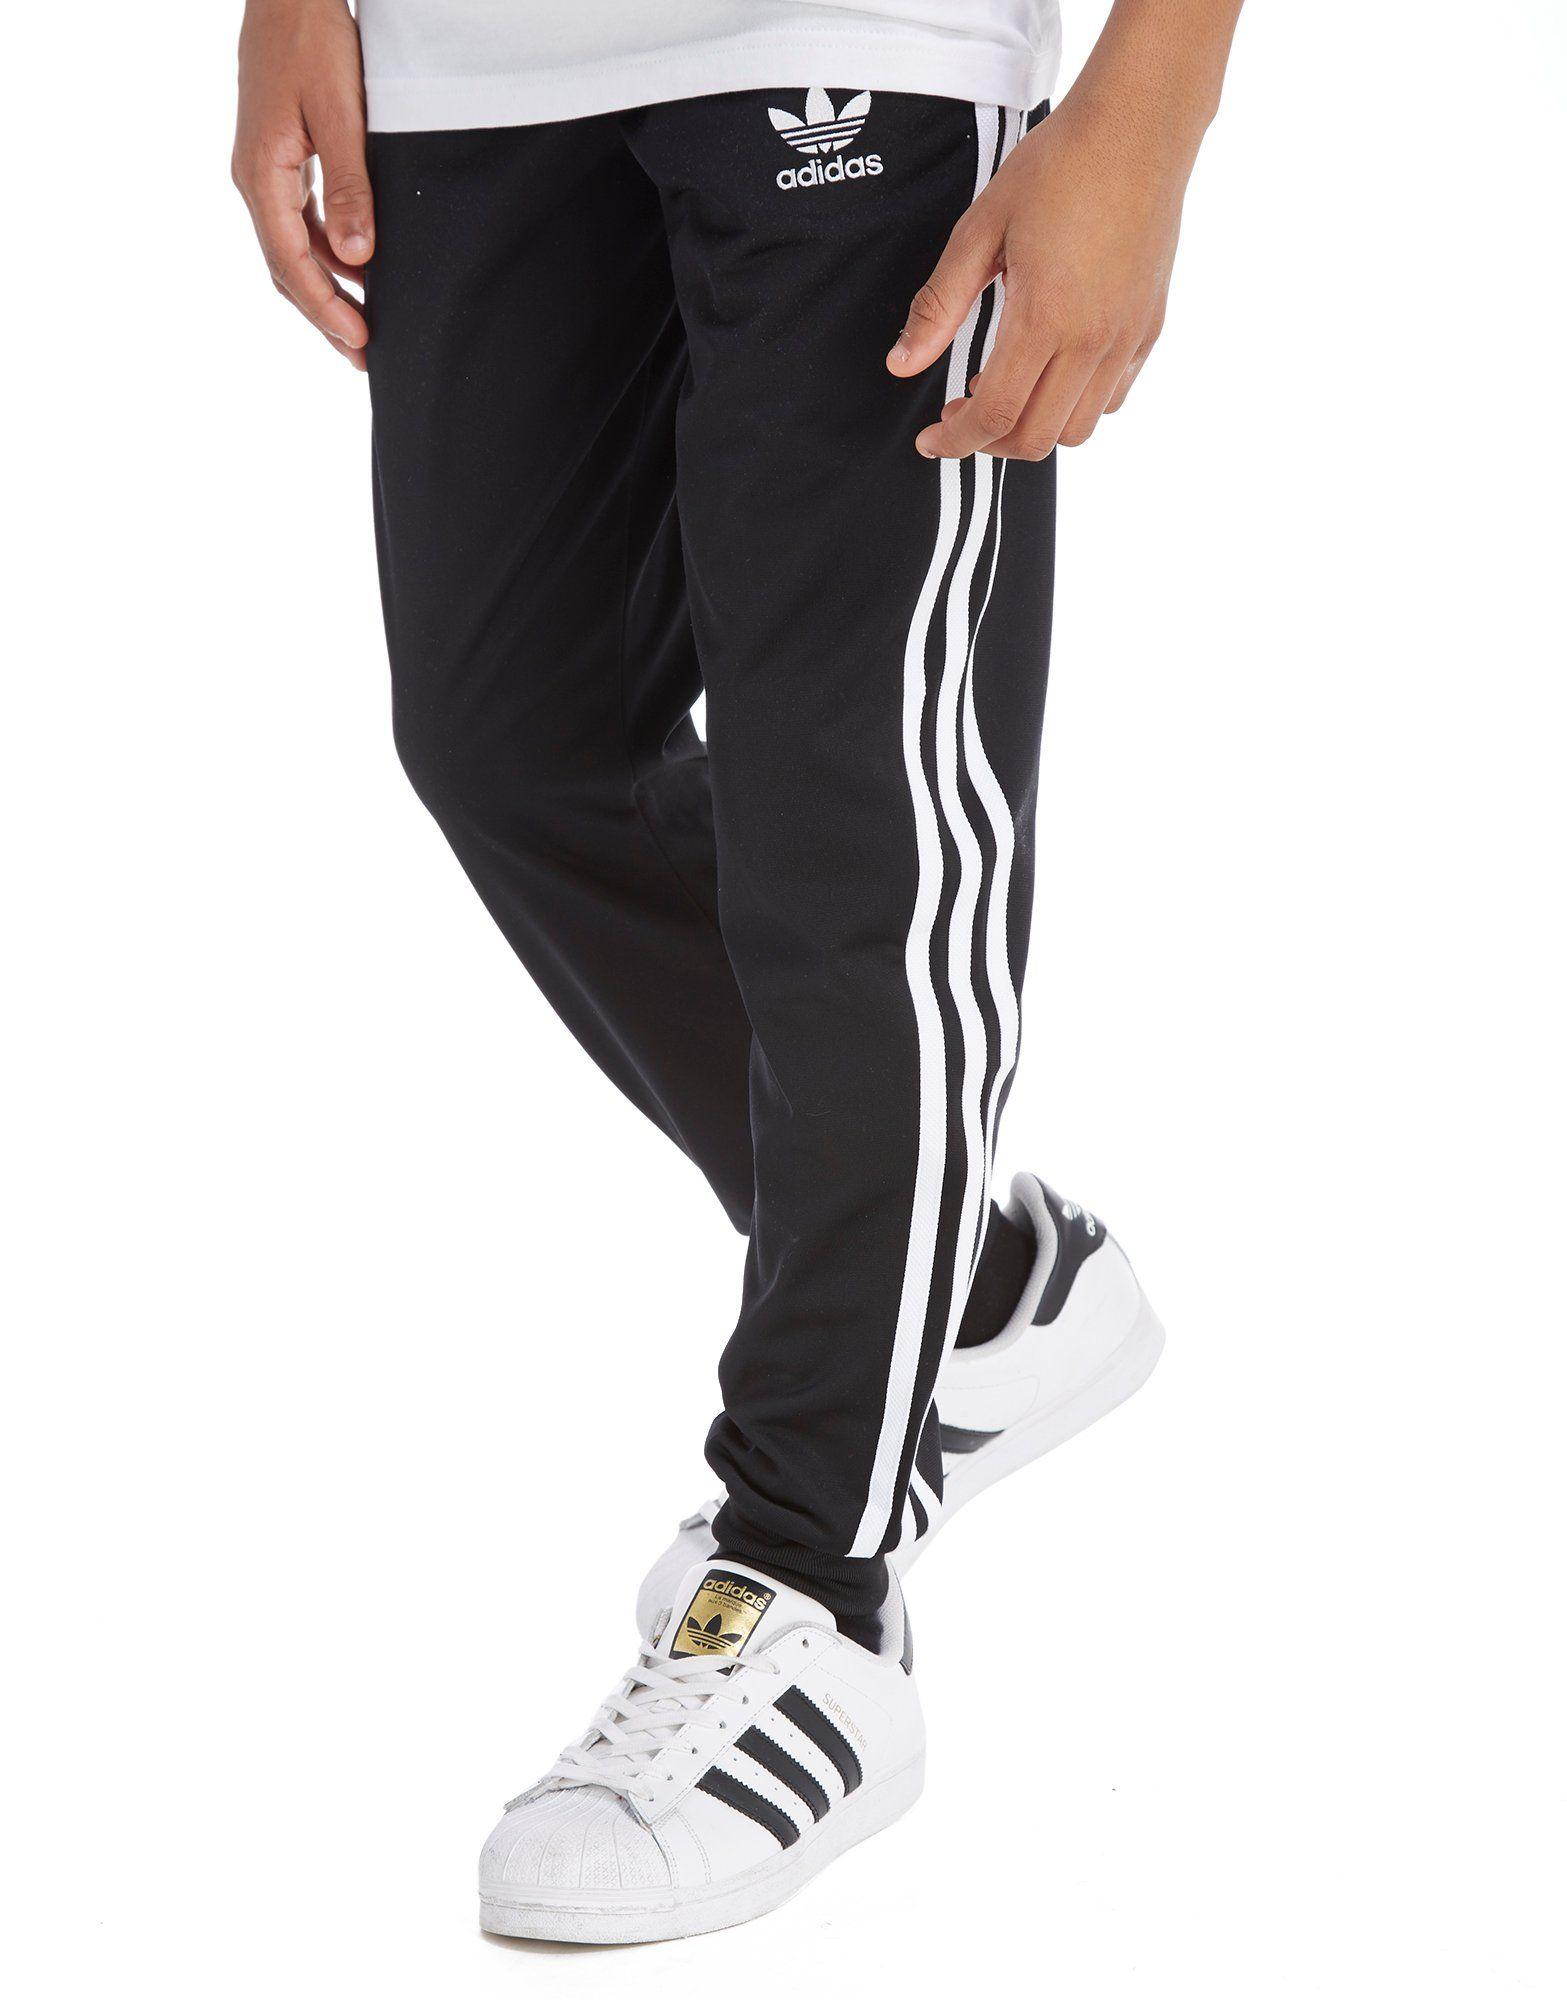 the best attitude b1a1a c06f5 adidas Originals Superstar Joggers Junior   JD Sports